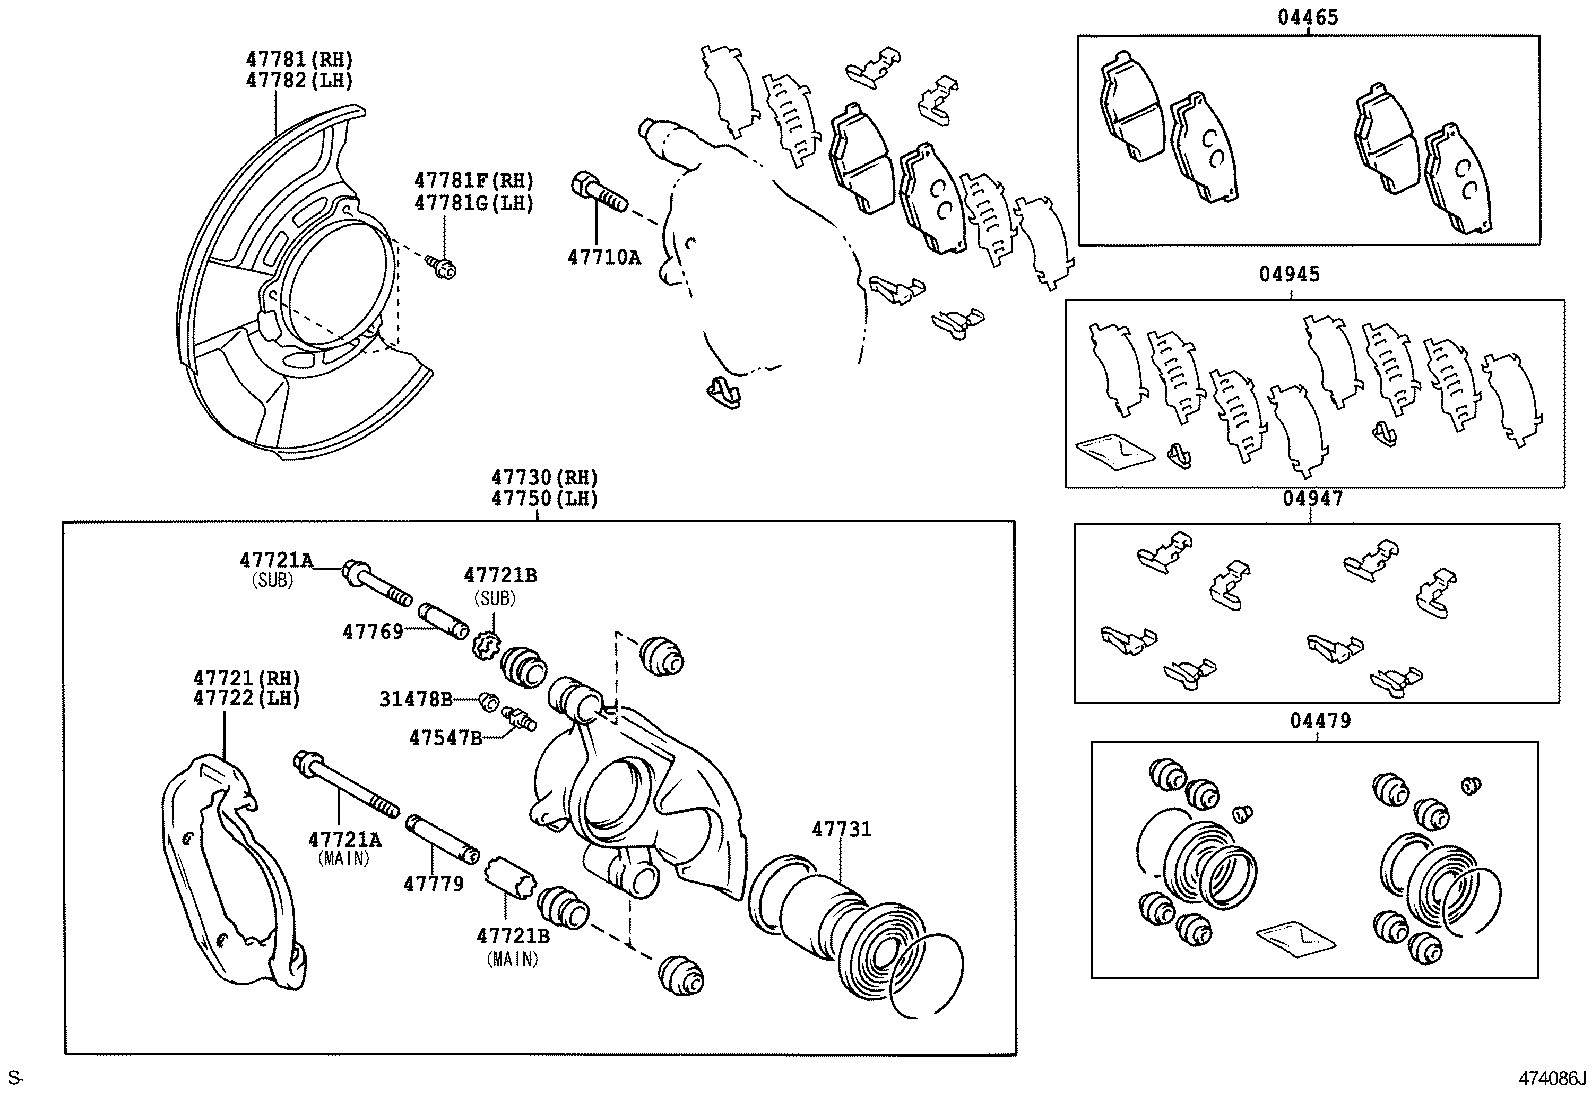 toyota hiluxkun10l-trmdyv - powertrain-chassis